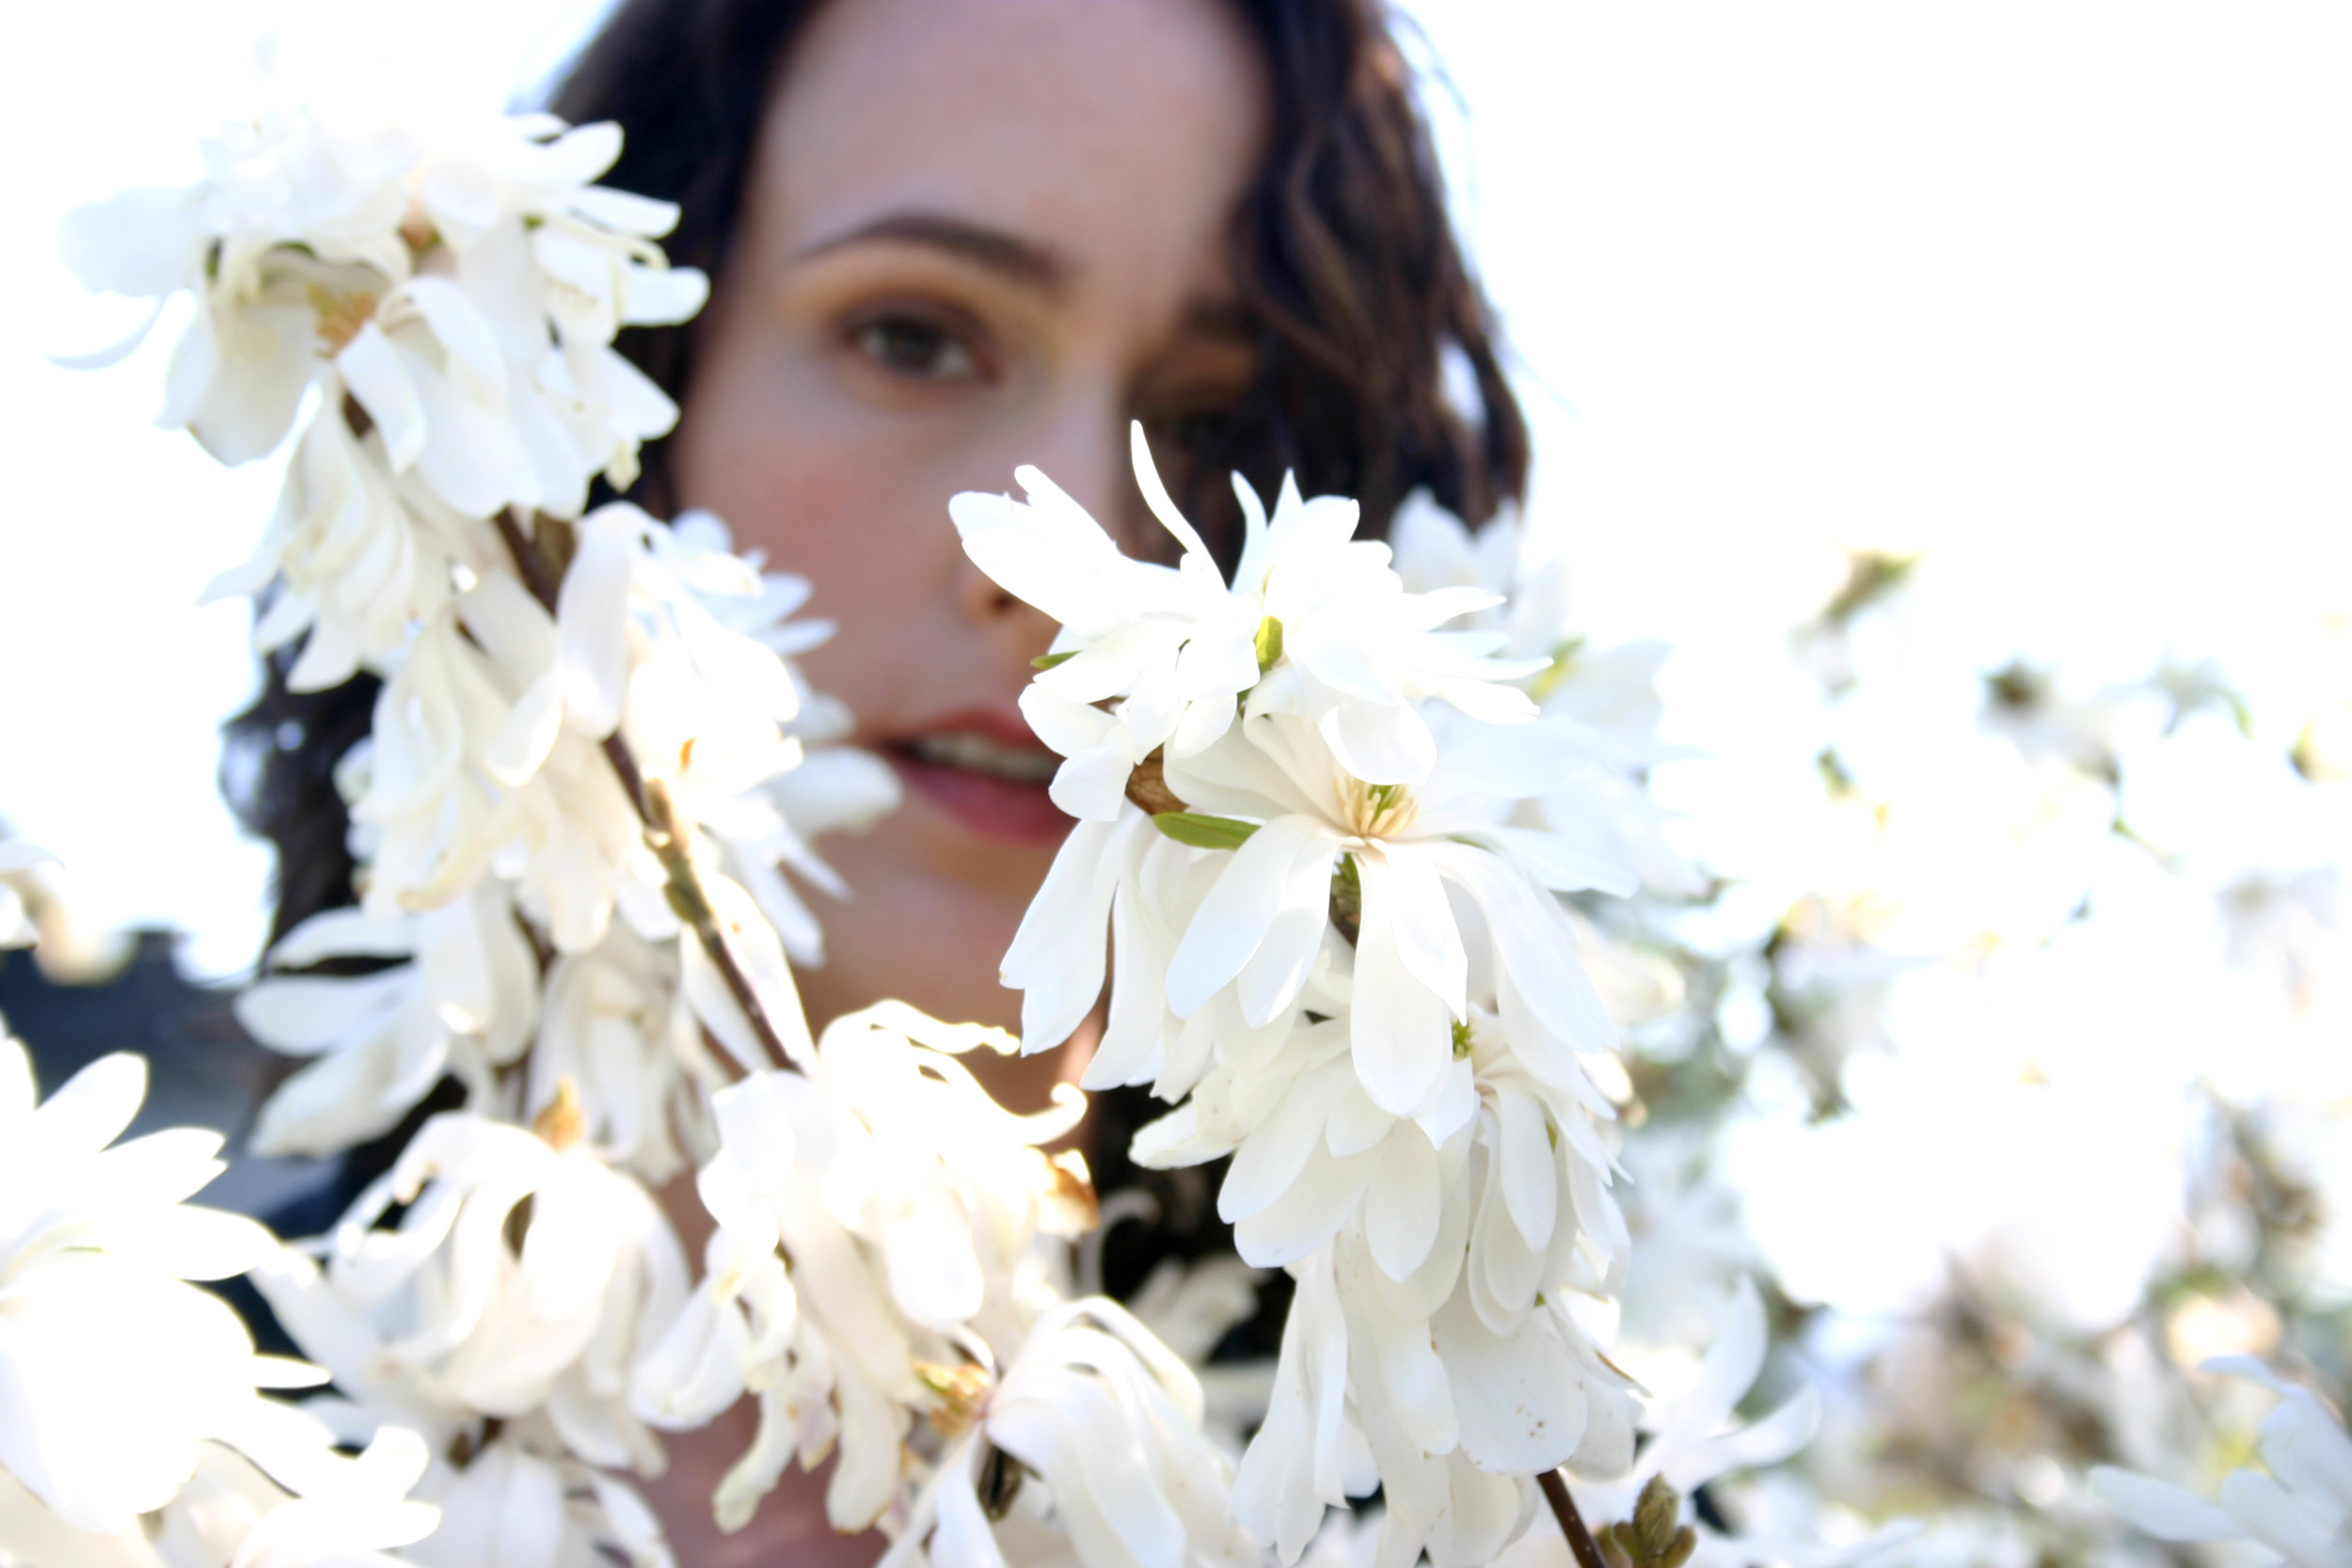 kelly_brightwell_flowers_leila_chieko.jpg